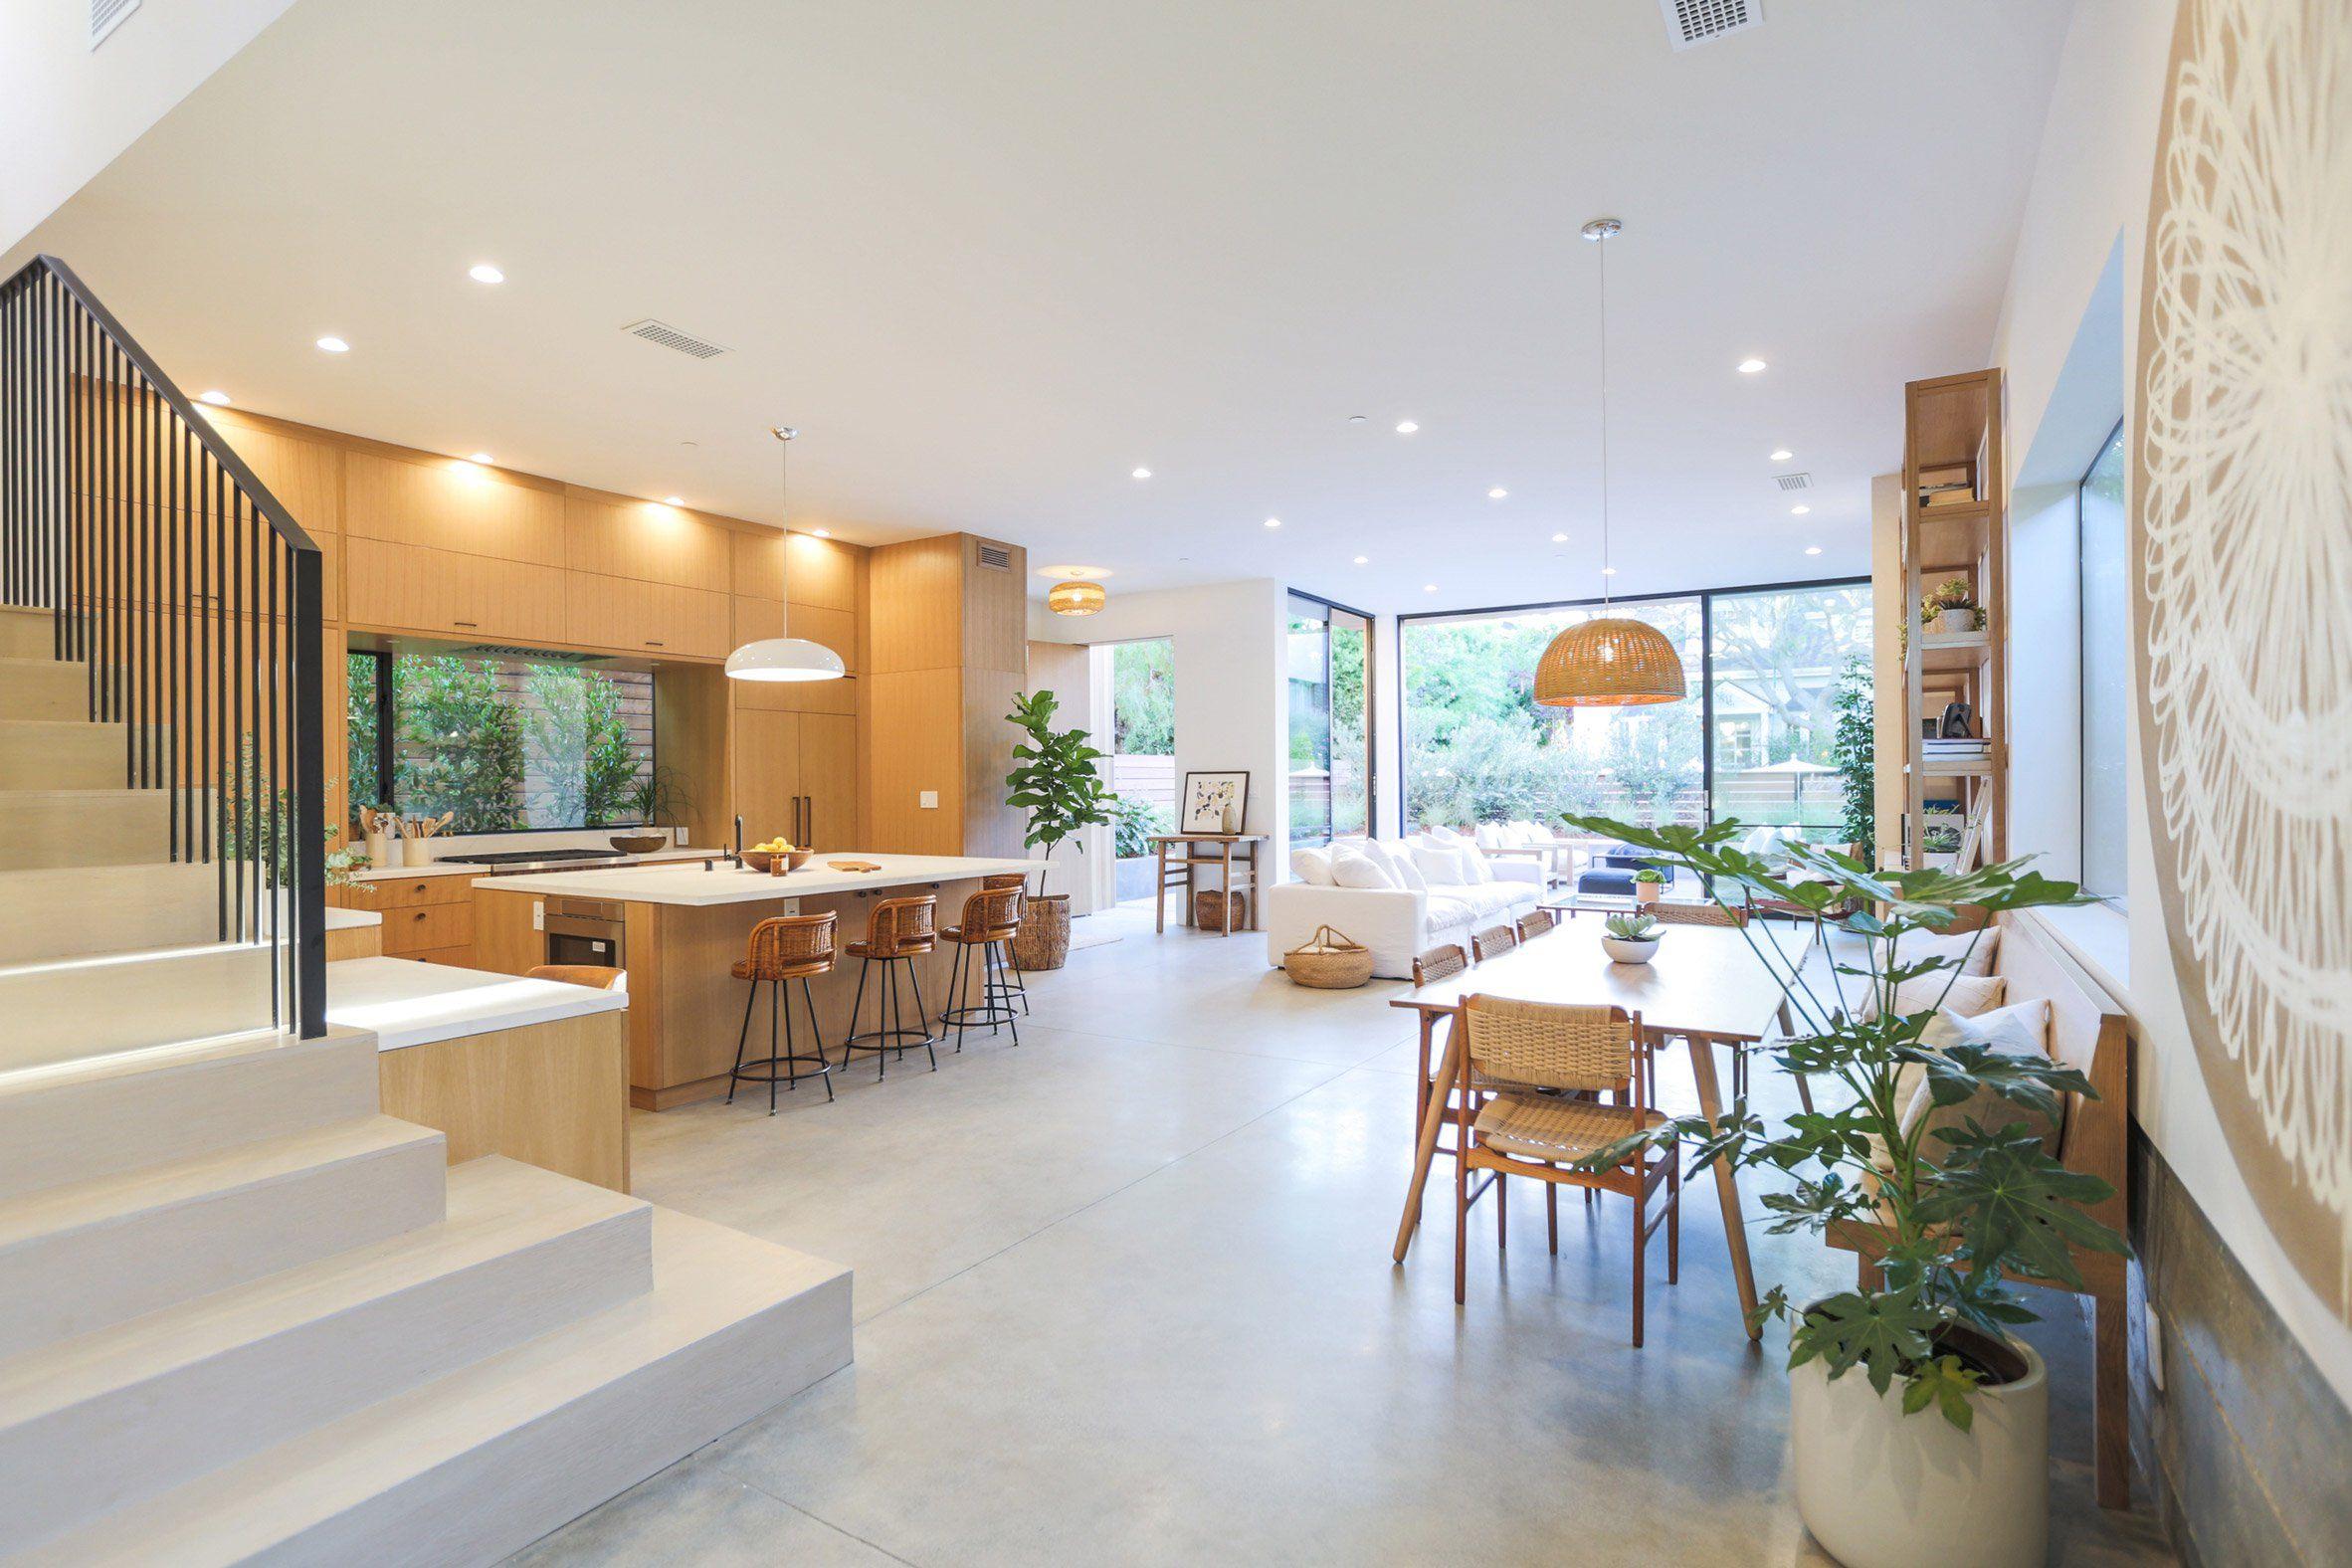 Amoroso residence california by electric bowery brigantine house